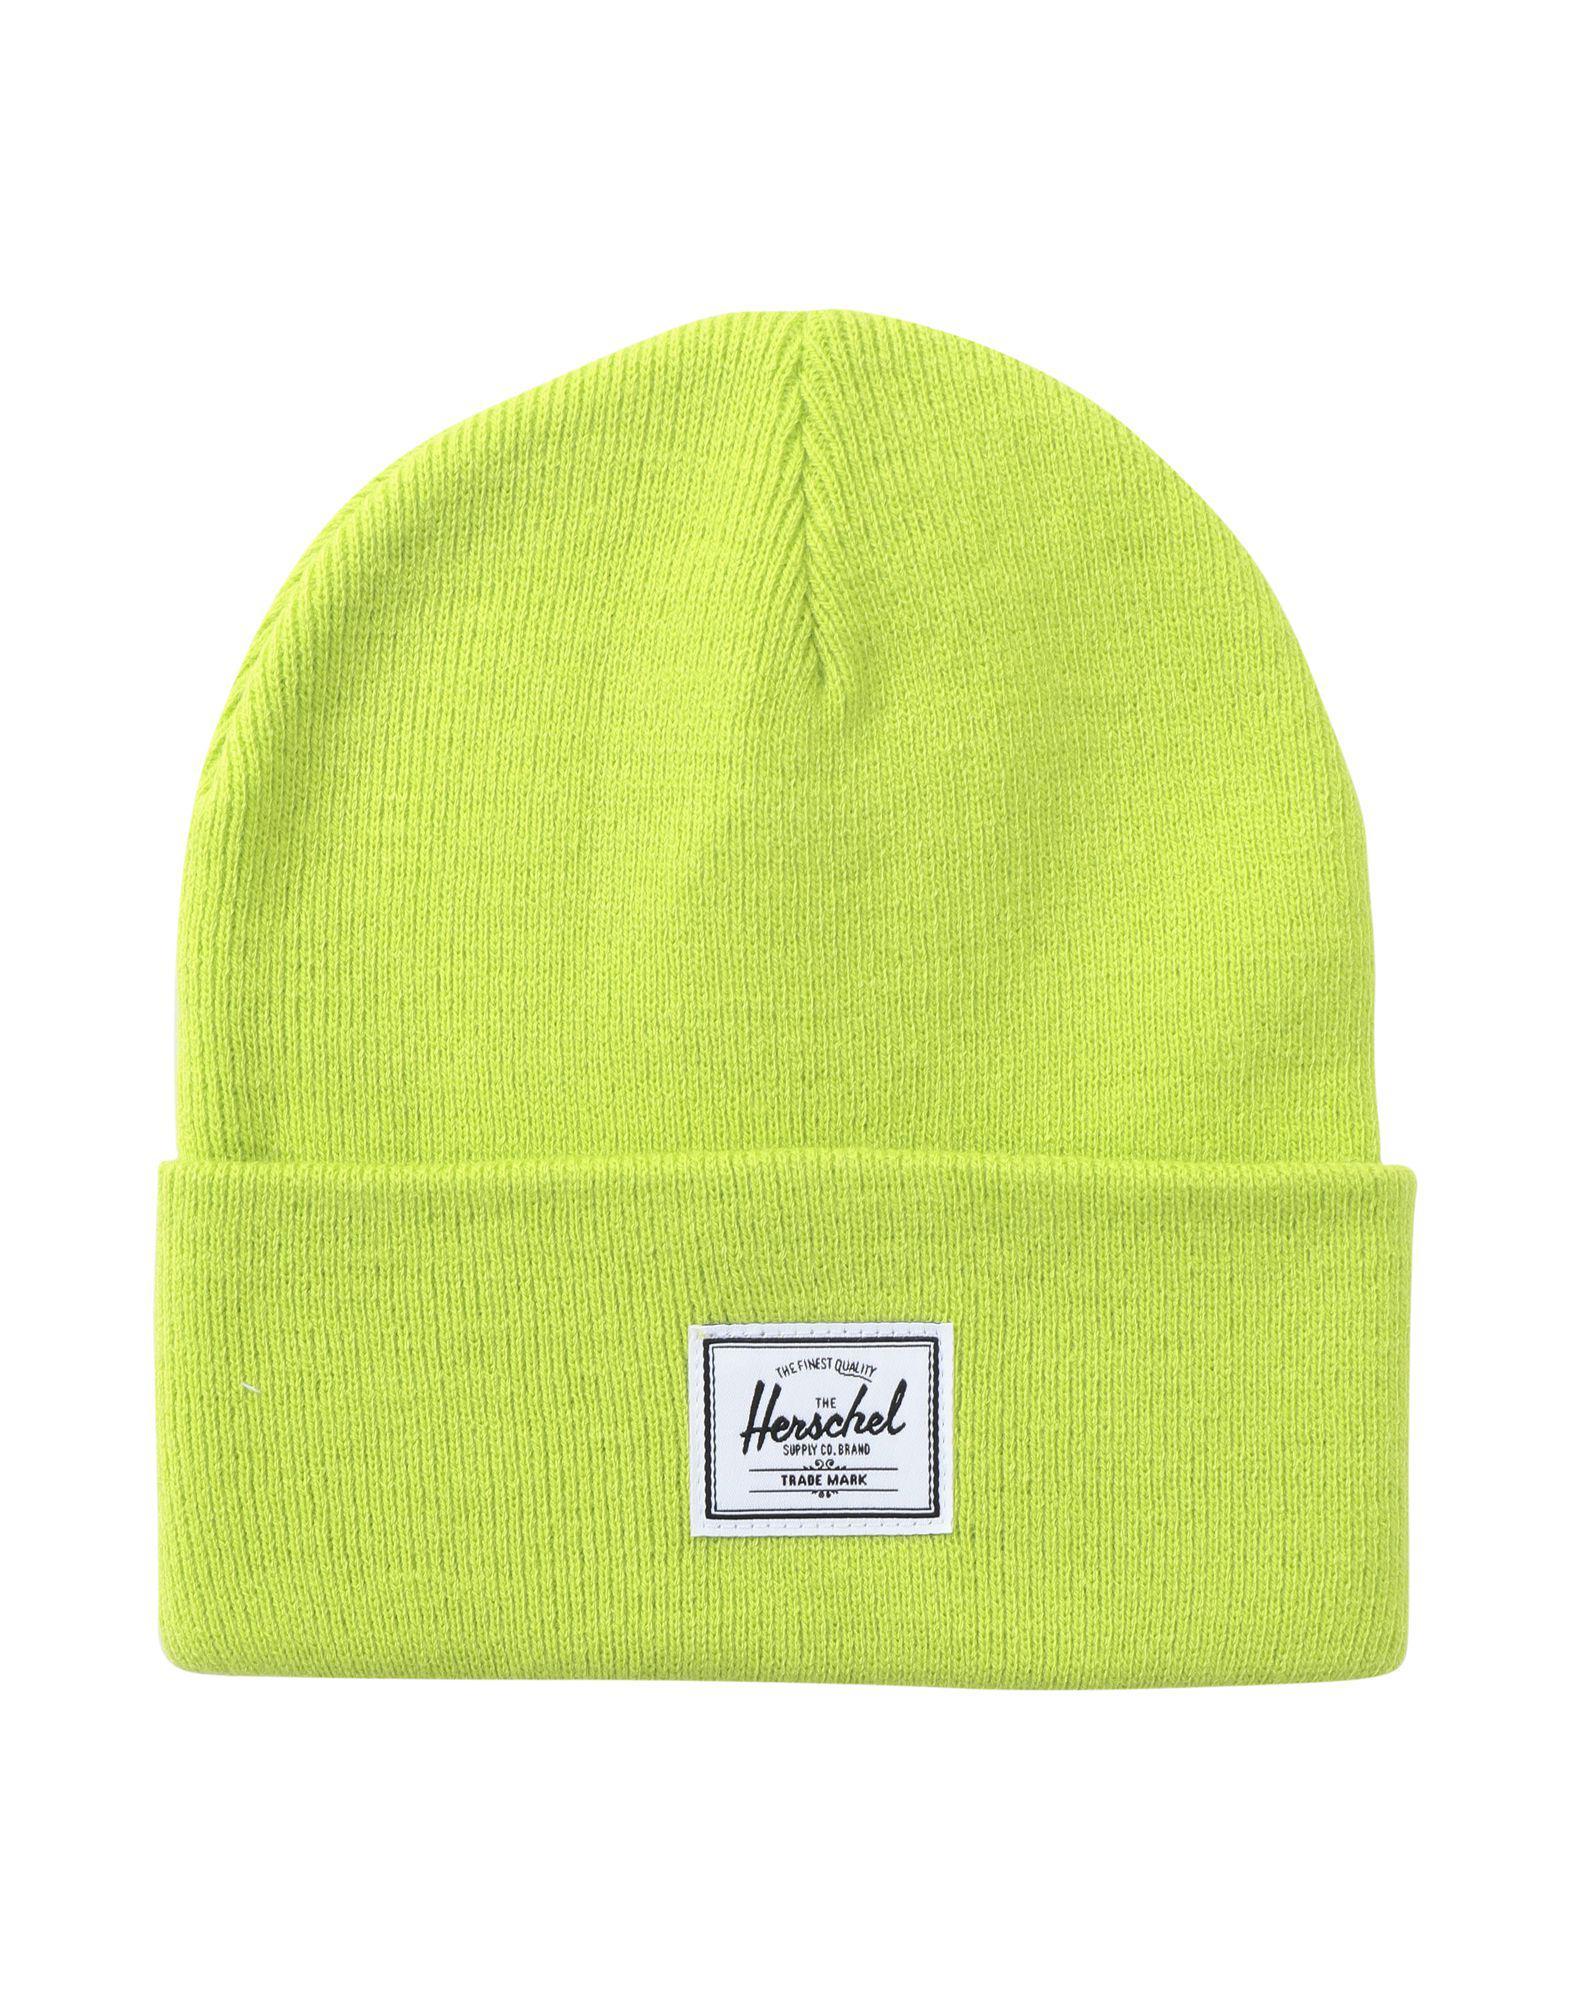 d1b68be502c Lyst - Herschel Supply Co. Hat in Green